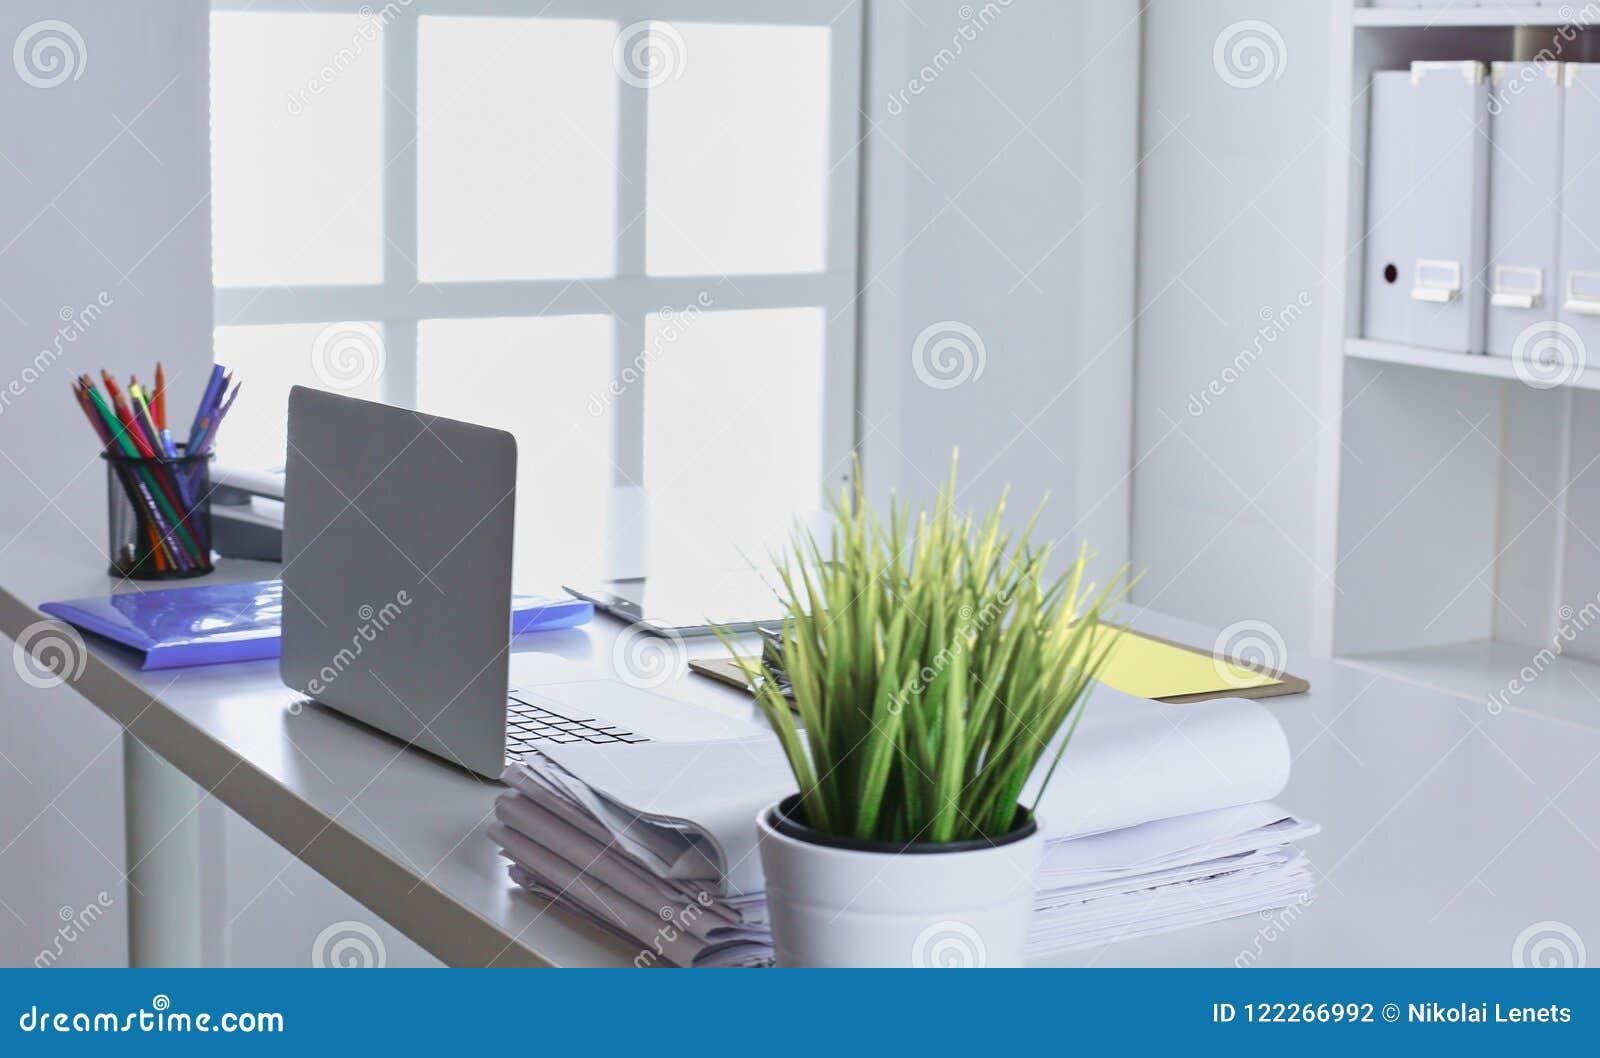 Merveilleux Download Workspace Presentation Mockup, Desktop Computer And Office Supp  Stock Photo   Image Of Hipster